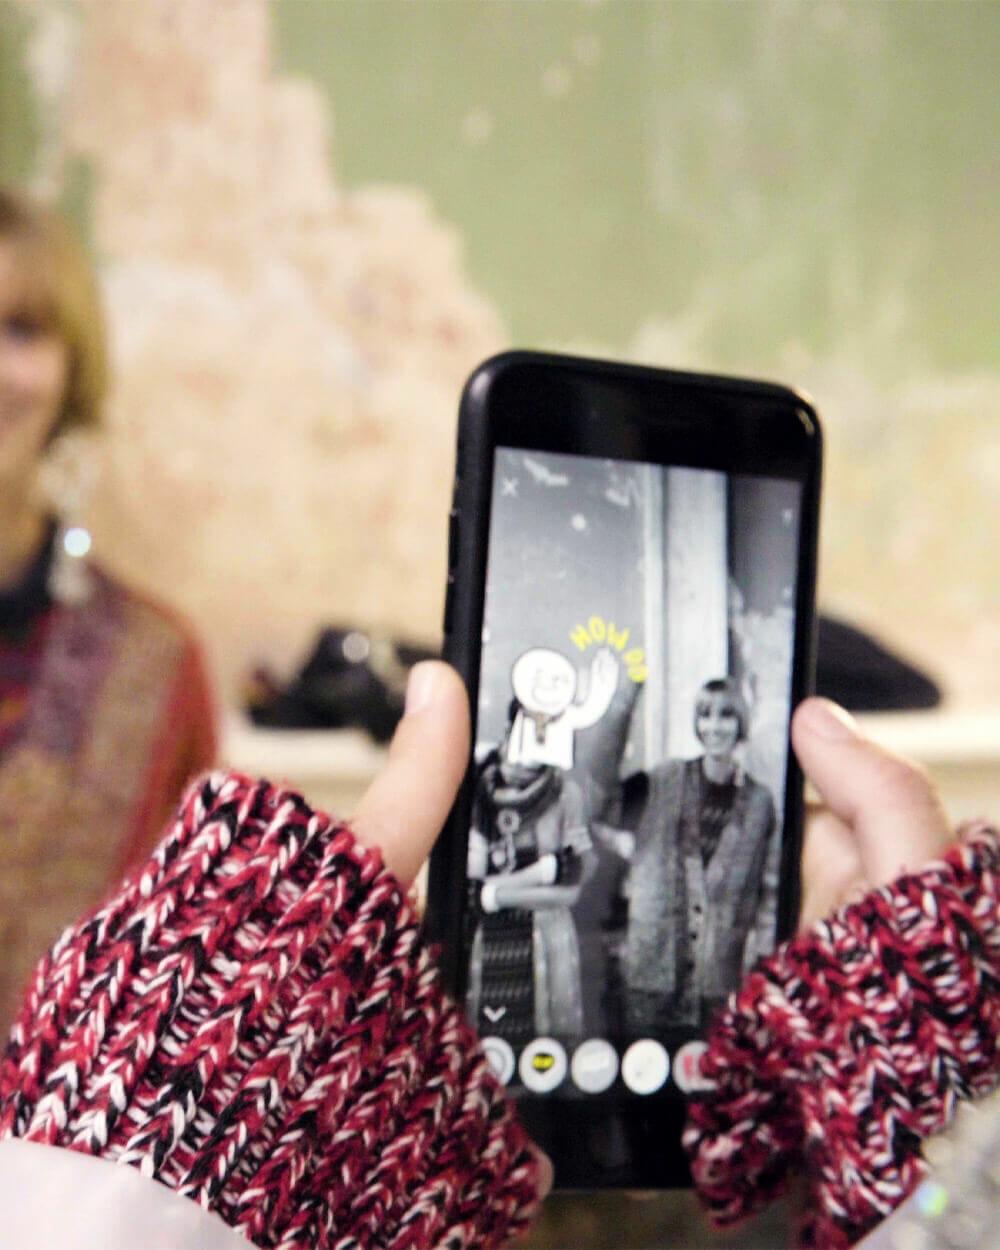 BURBERRY 'ARKit' VR app